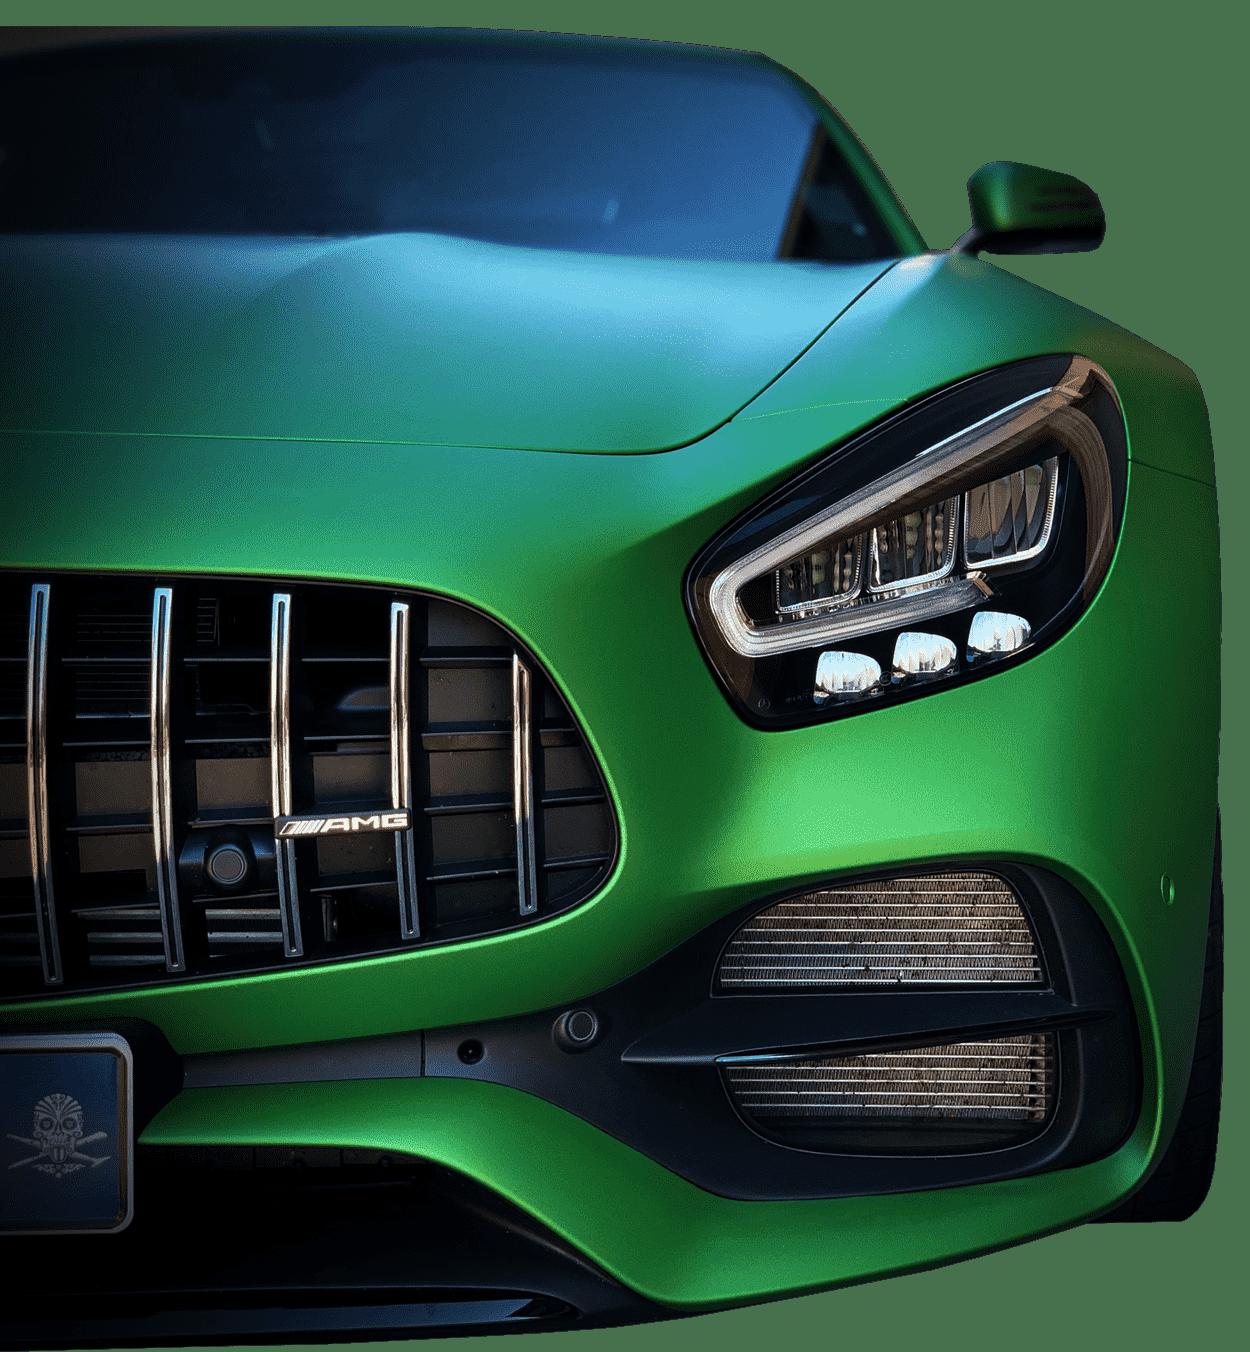 kiwi graphics-AMG-Mercedes-Vollfolierung-Auto-Carwrapping-Aschaffenburg